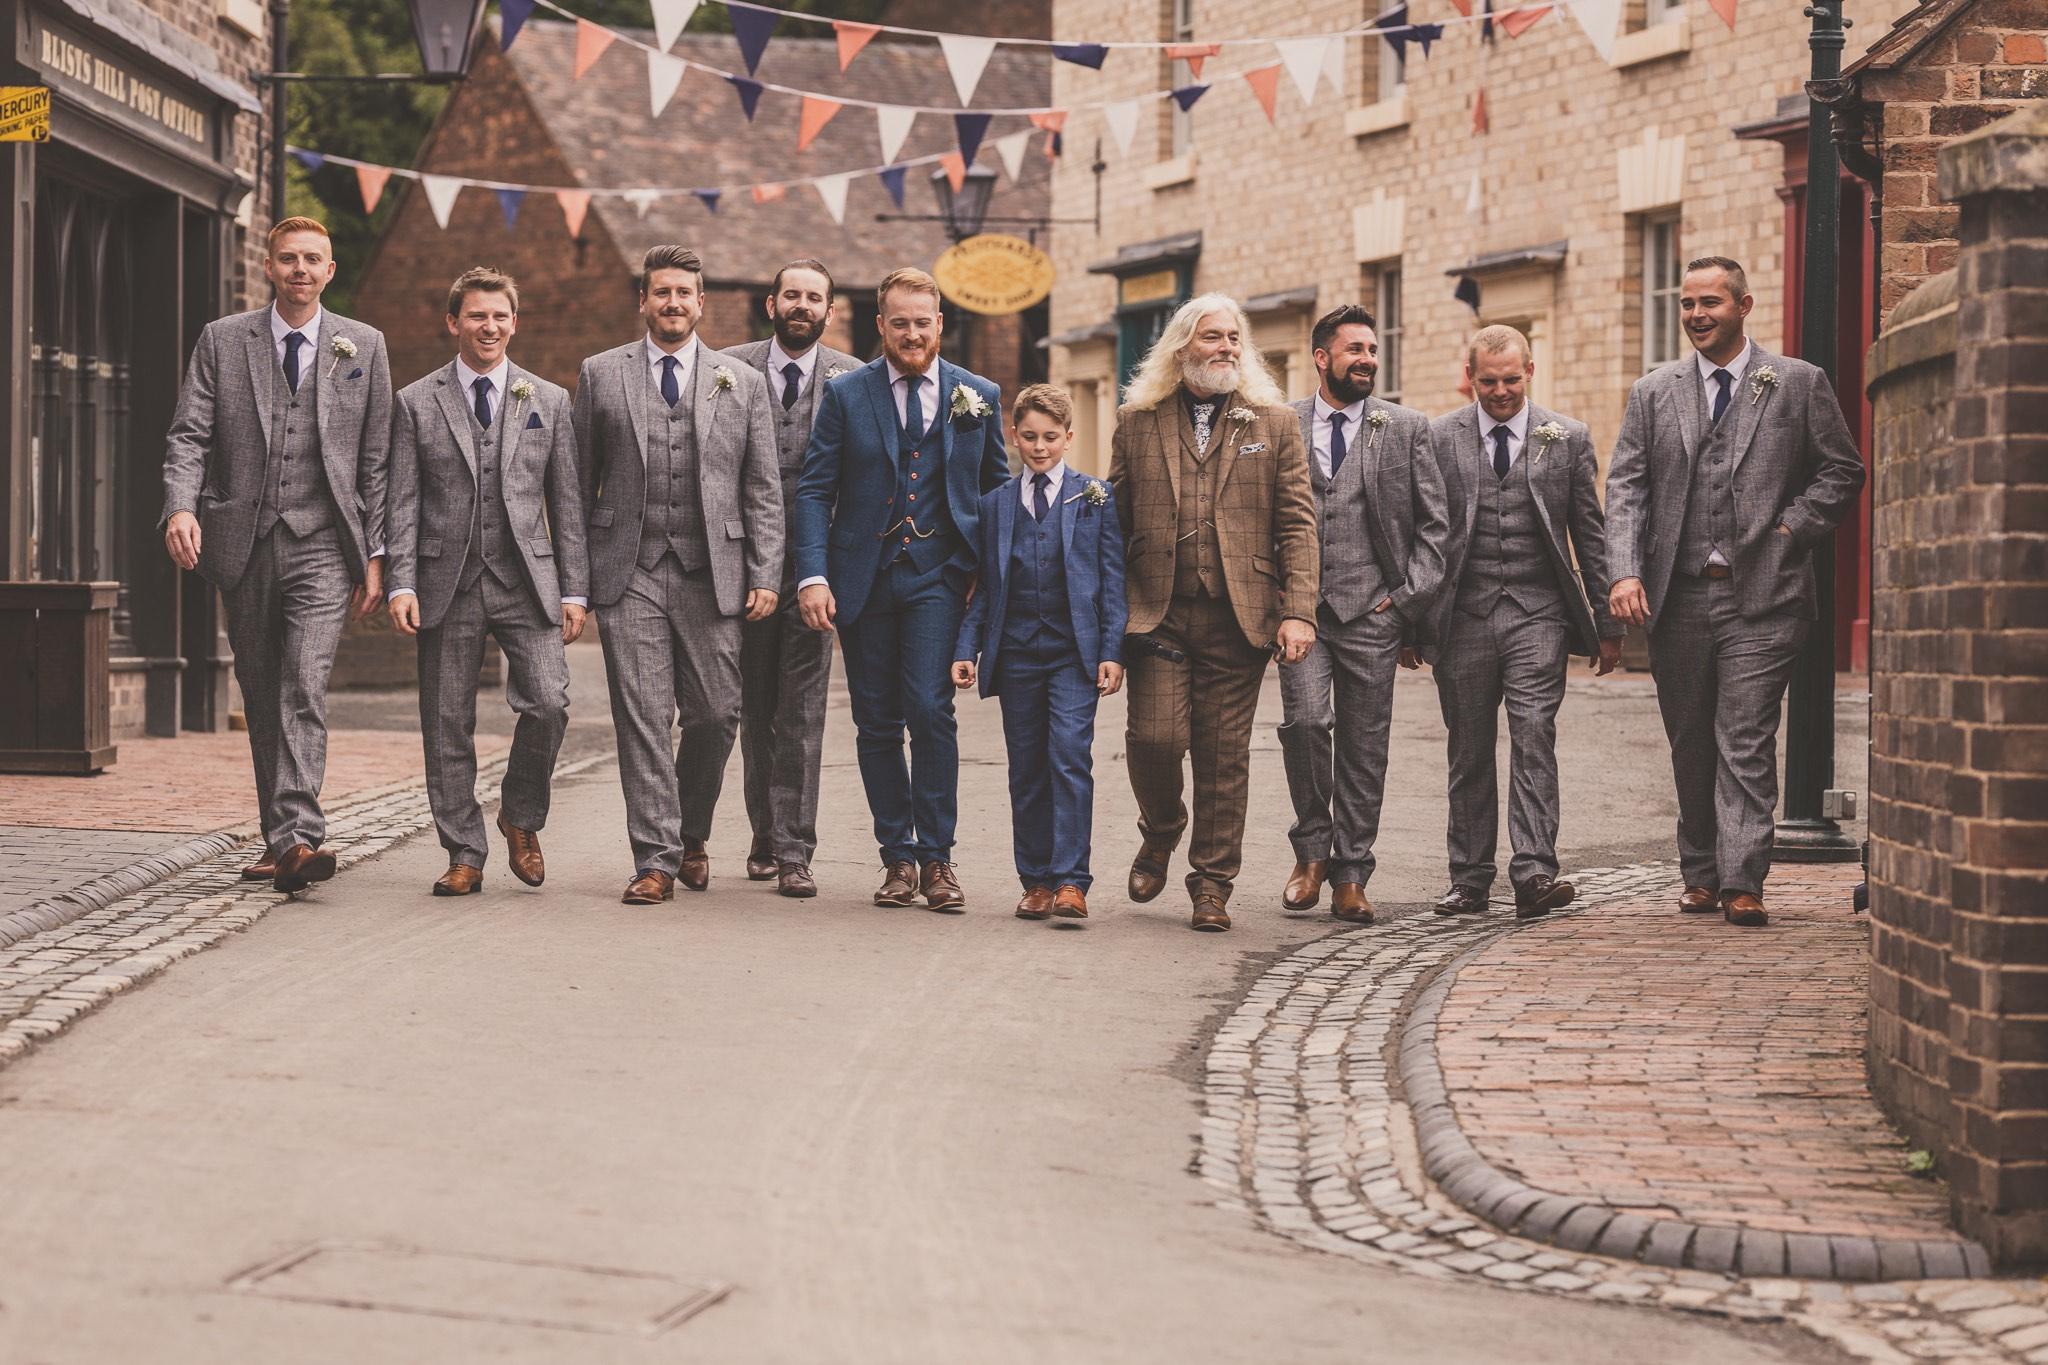 groom and groomsmen walking down a vintage street at Blists Hill Victorian Town, Ironbridge